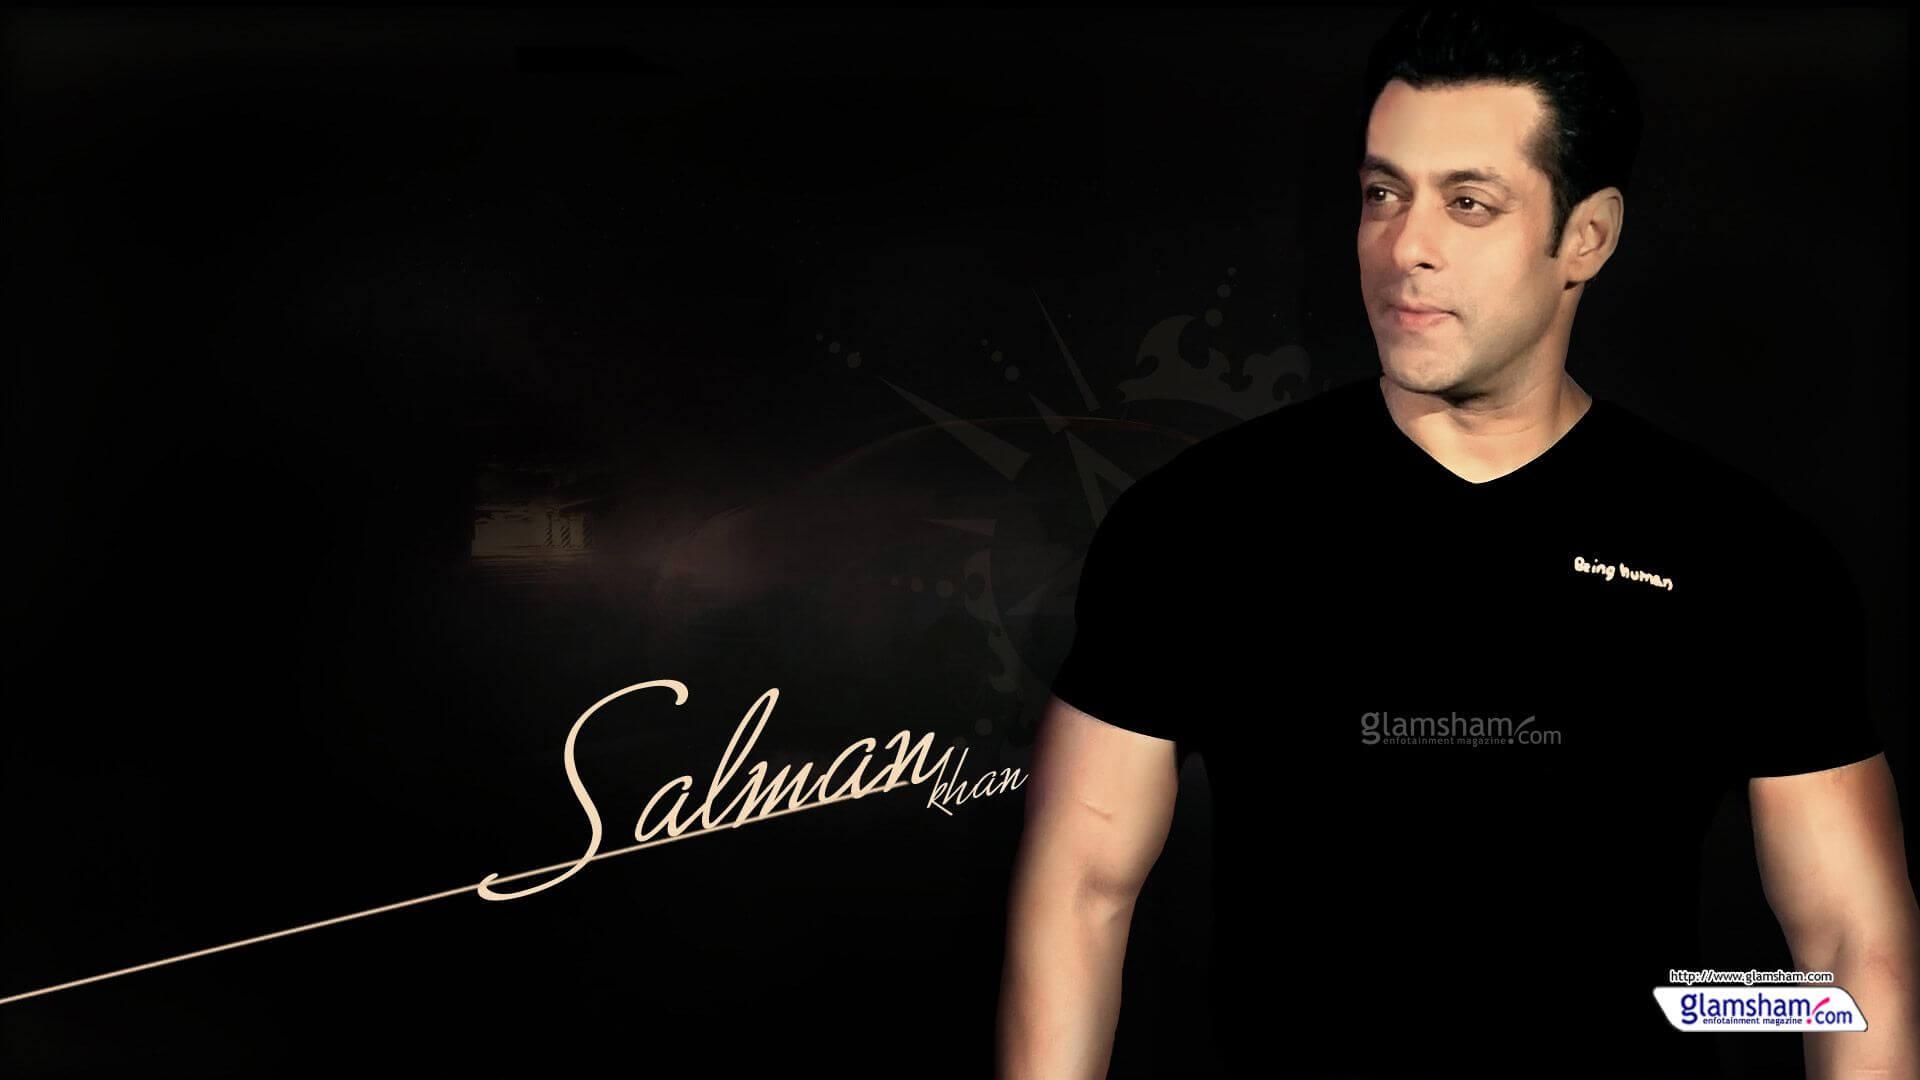 Salman Khan Photo, Age, News, Birthday, Height, Sister, Biography, Girlfriend, Awards, Address, Song, Video, Net Worth, Education, Twitter, Instagram, Facebook, Wiki, Imdb, Website, Youtube (100)